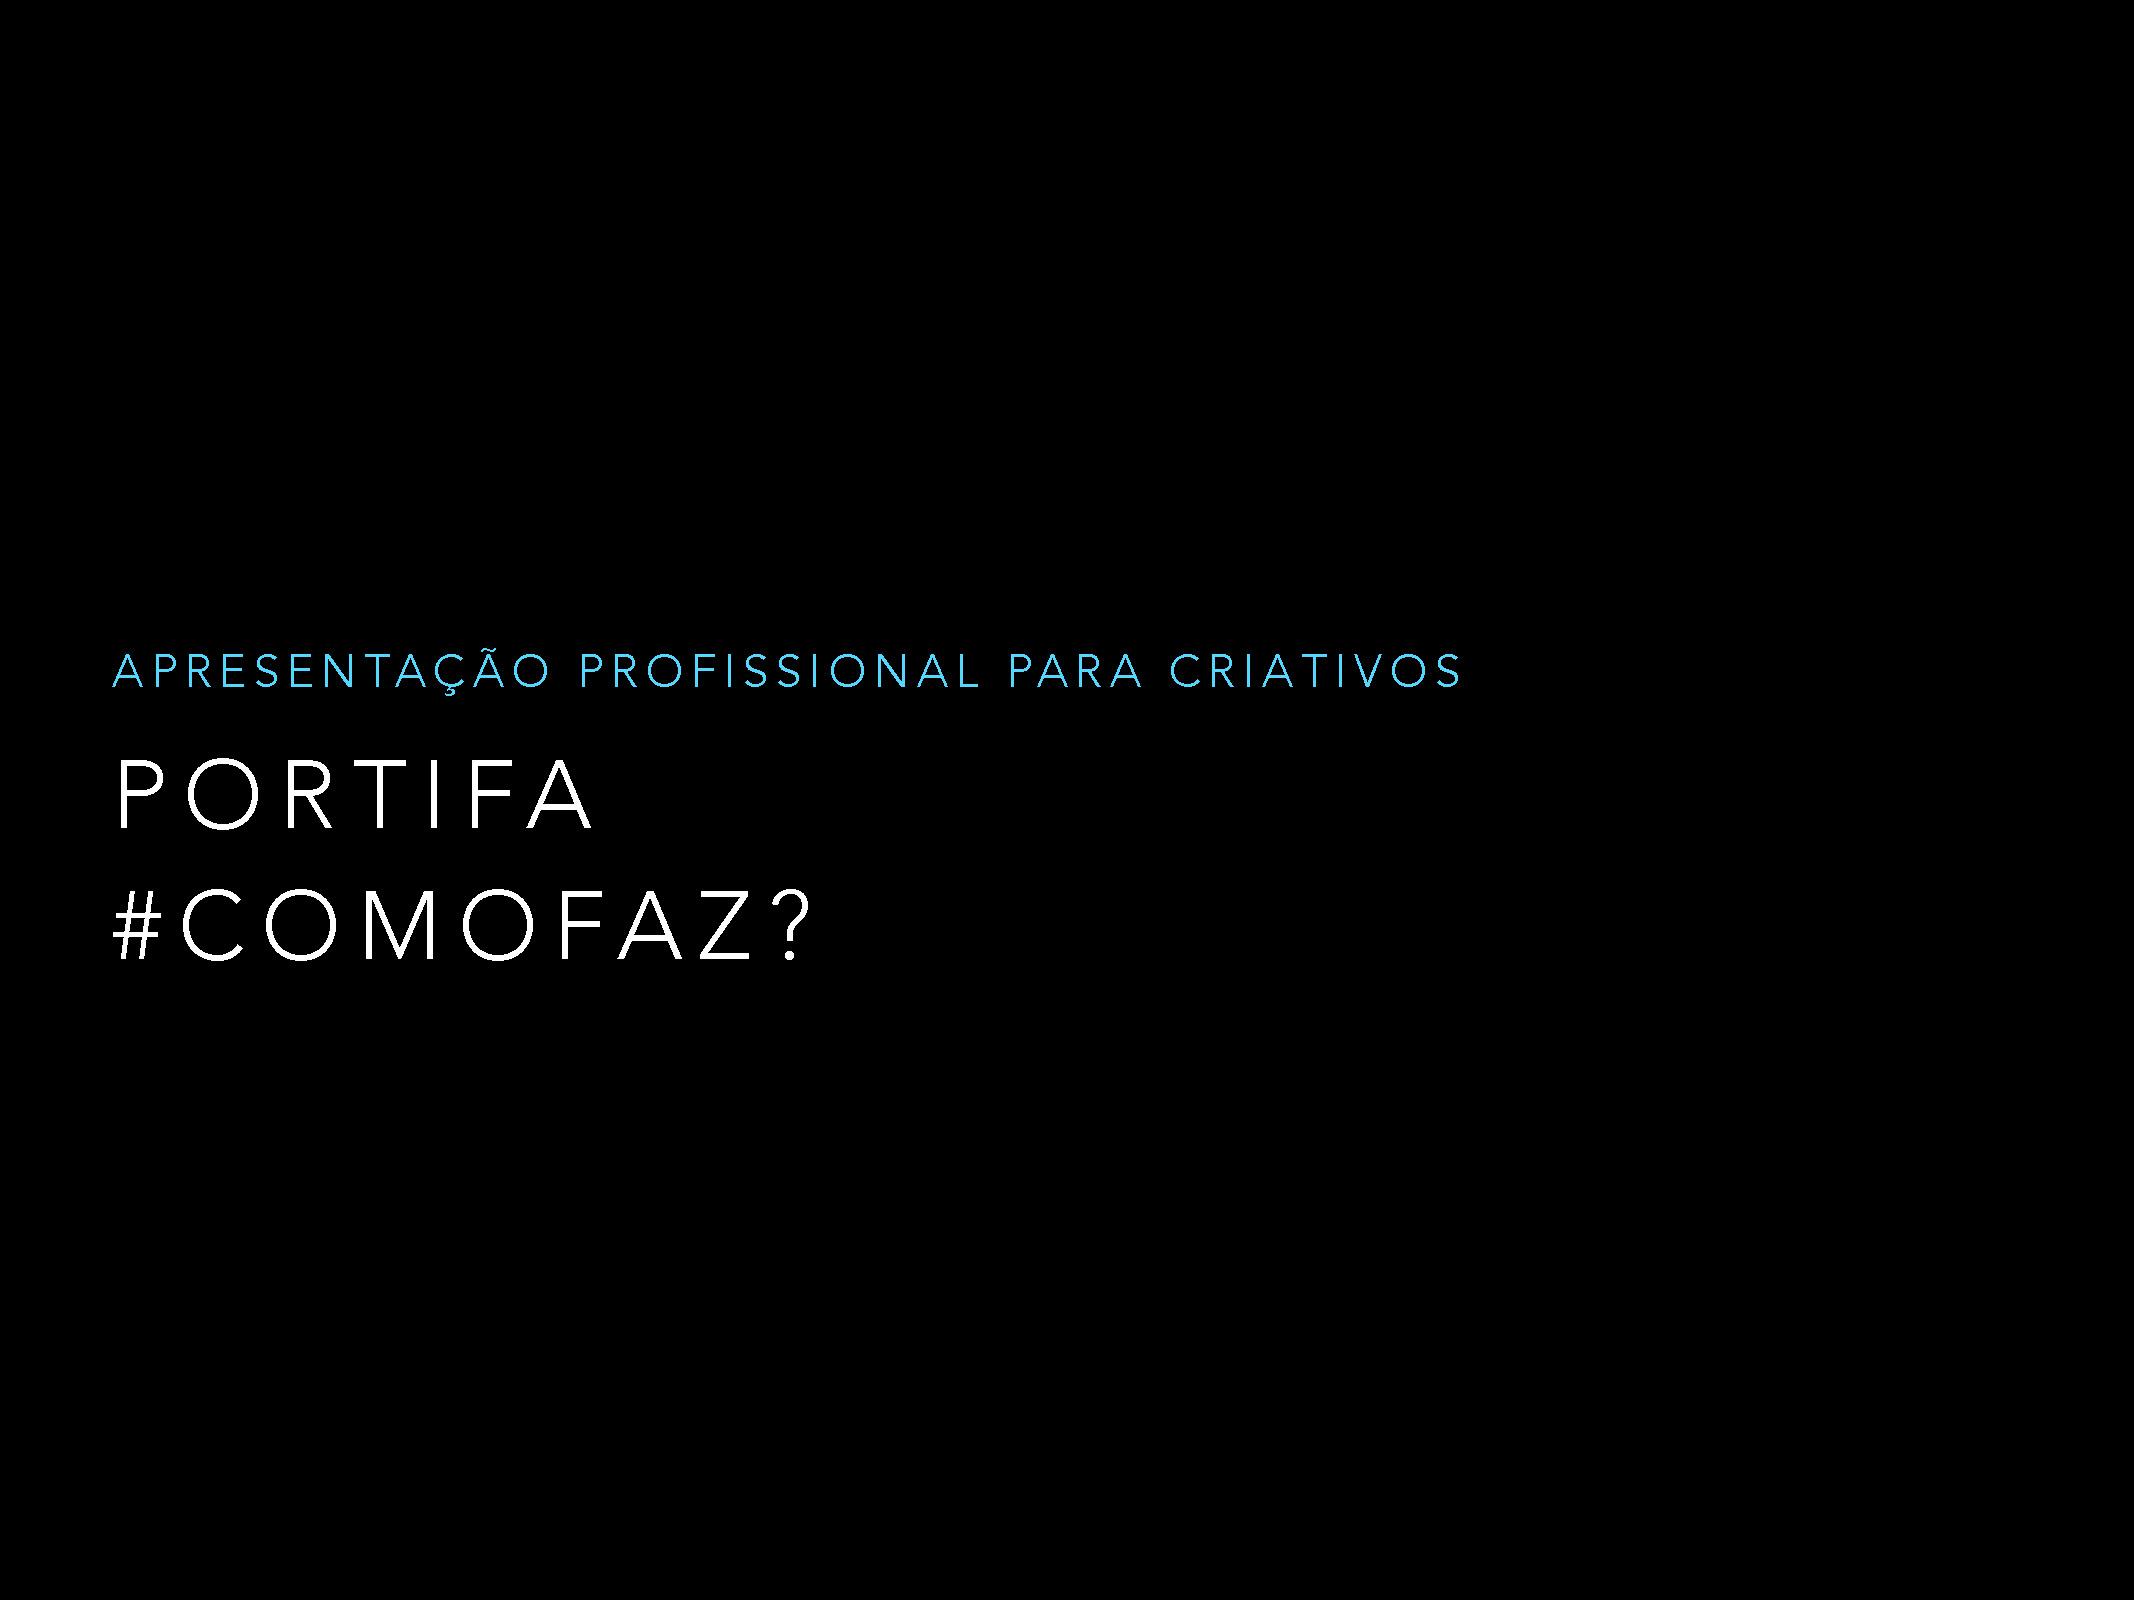 PORTIFA COMOFAZ? - Hellem Pedroso_Page_01.jpg